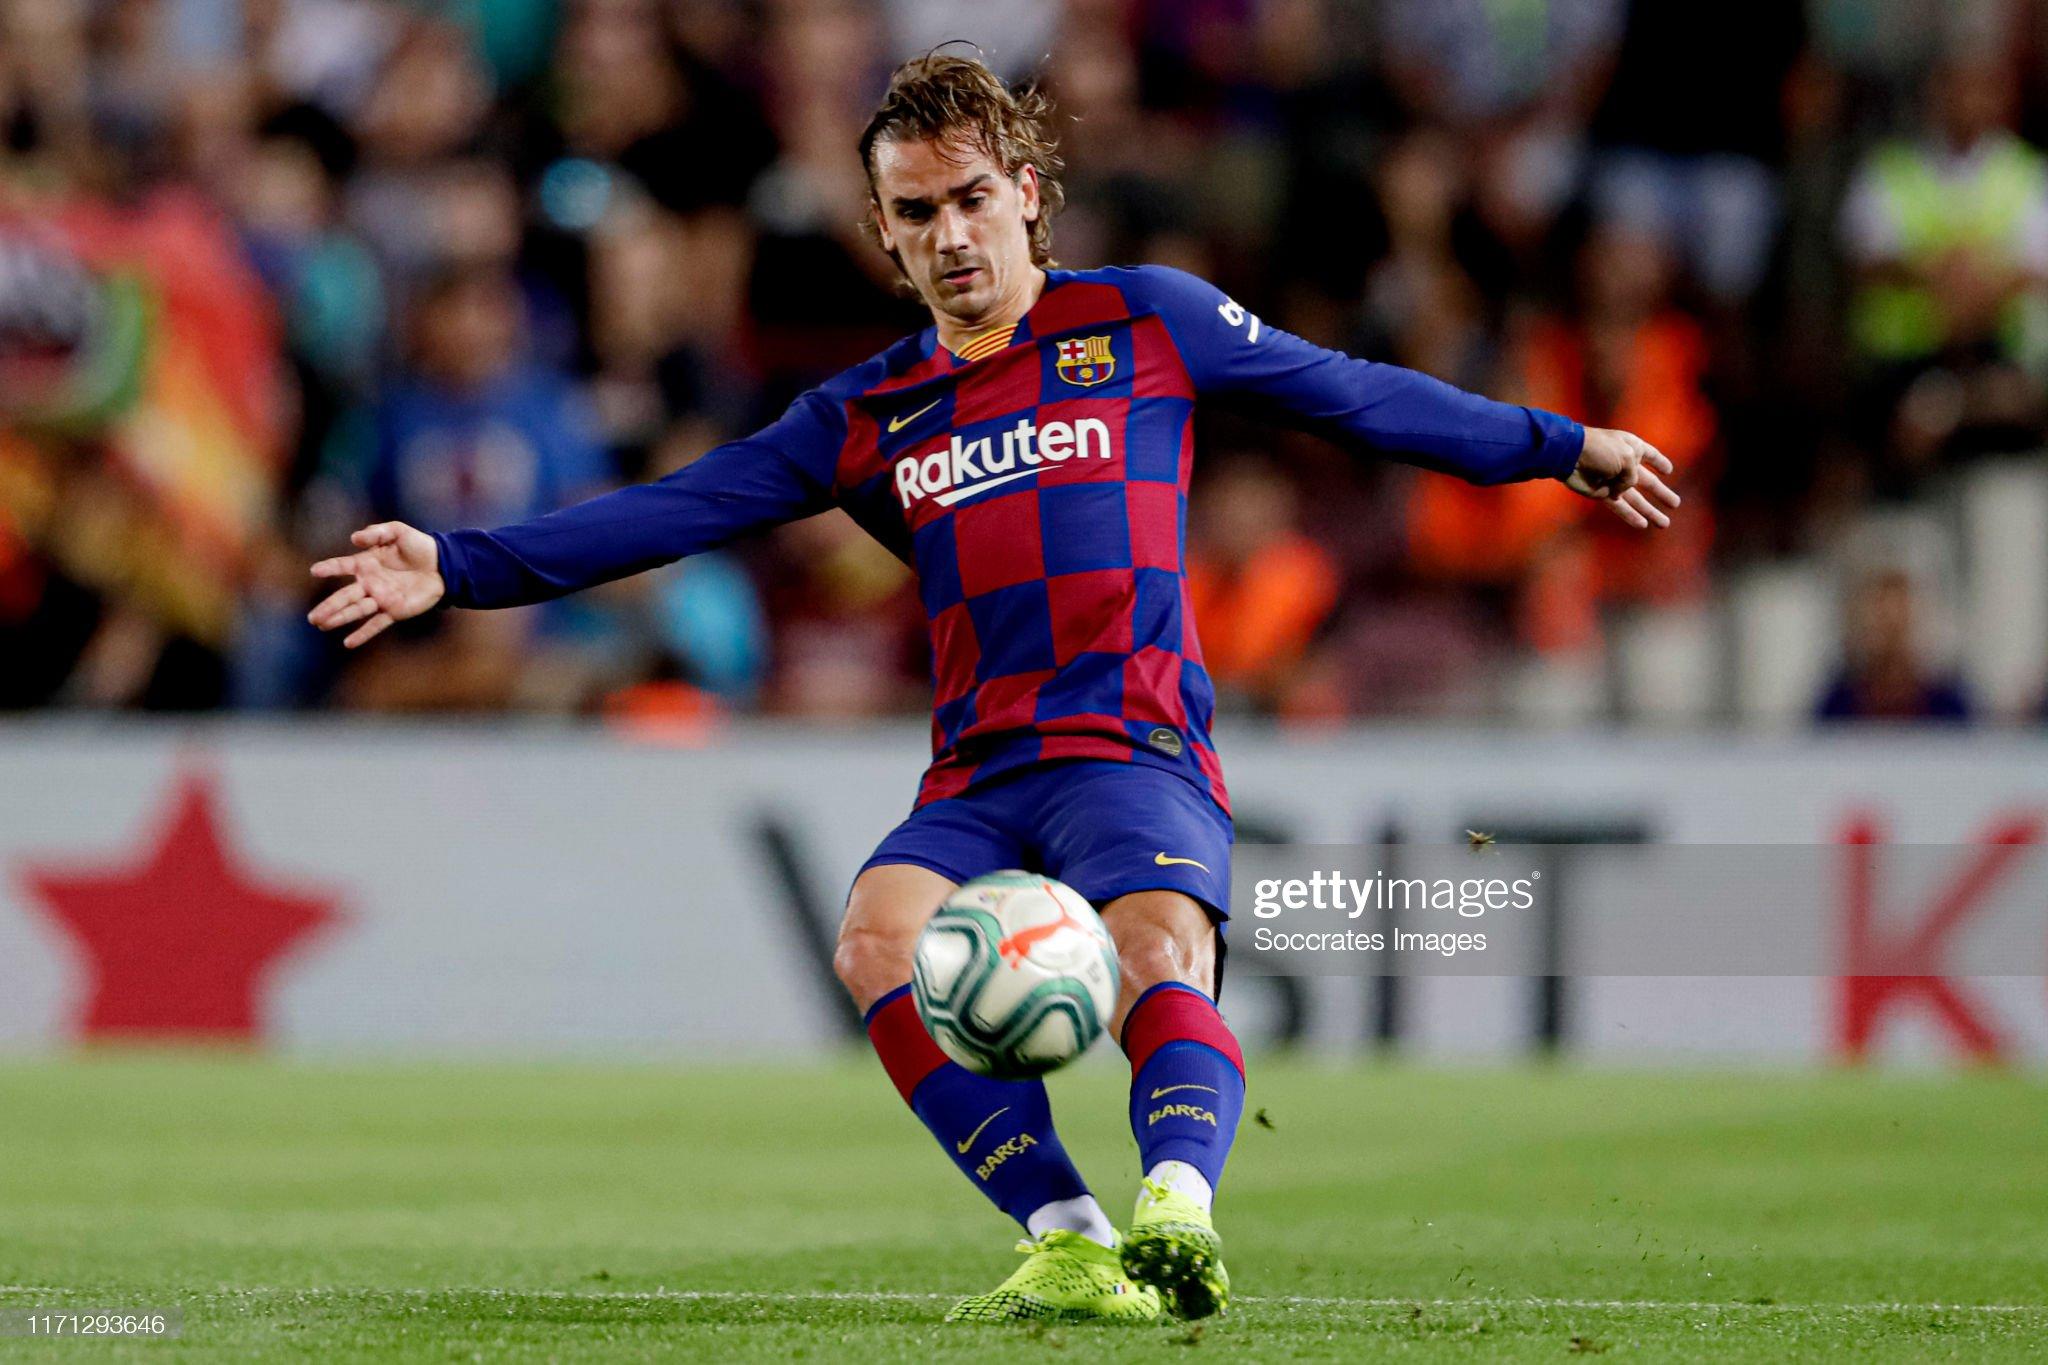 صور مباراة : برشلونة - فياريال 2-1 ( 24-09-2019 )  Antoine-griezmann-of-fc-barcelona-during-the-la-liga-santander-match-picture-id1171293646?s=2048x2048